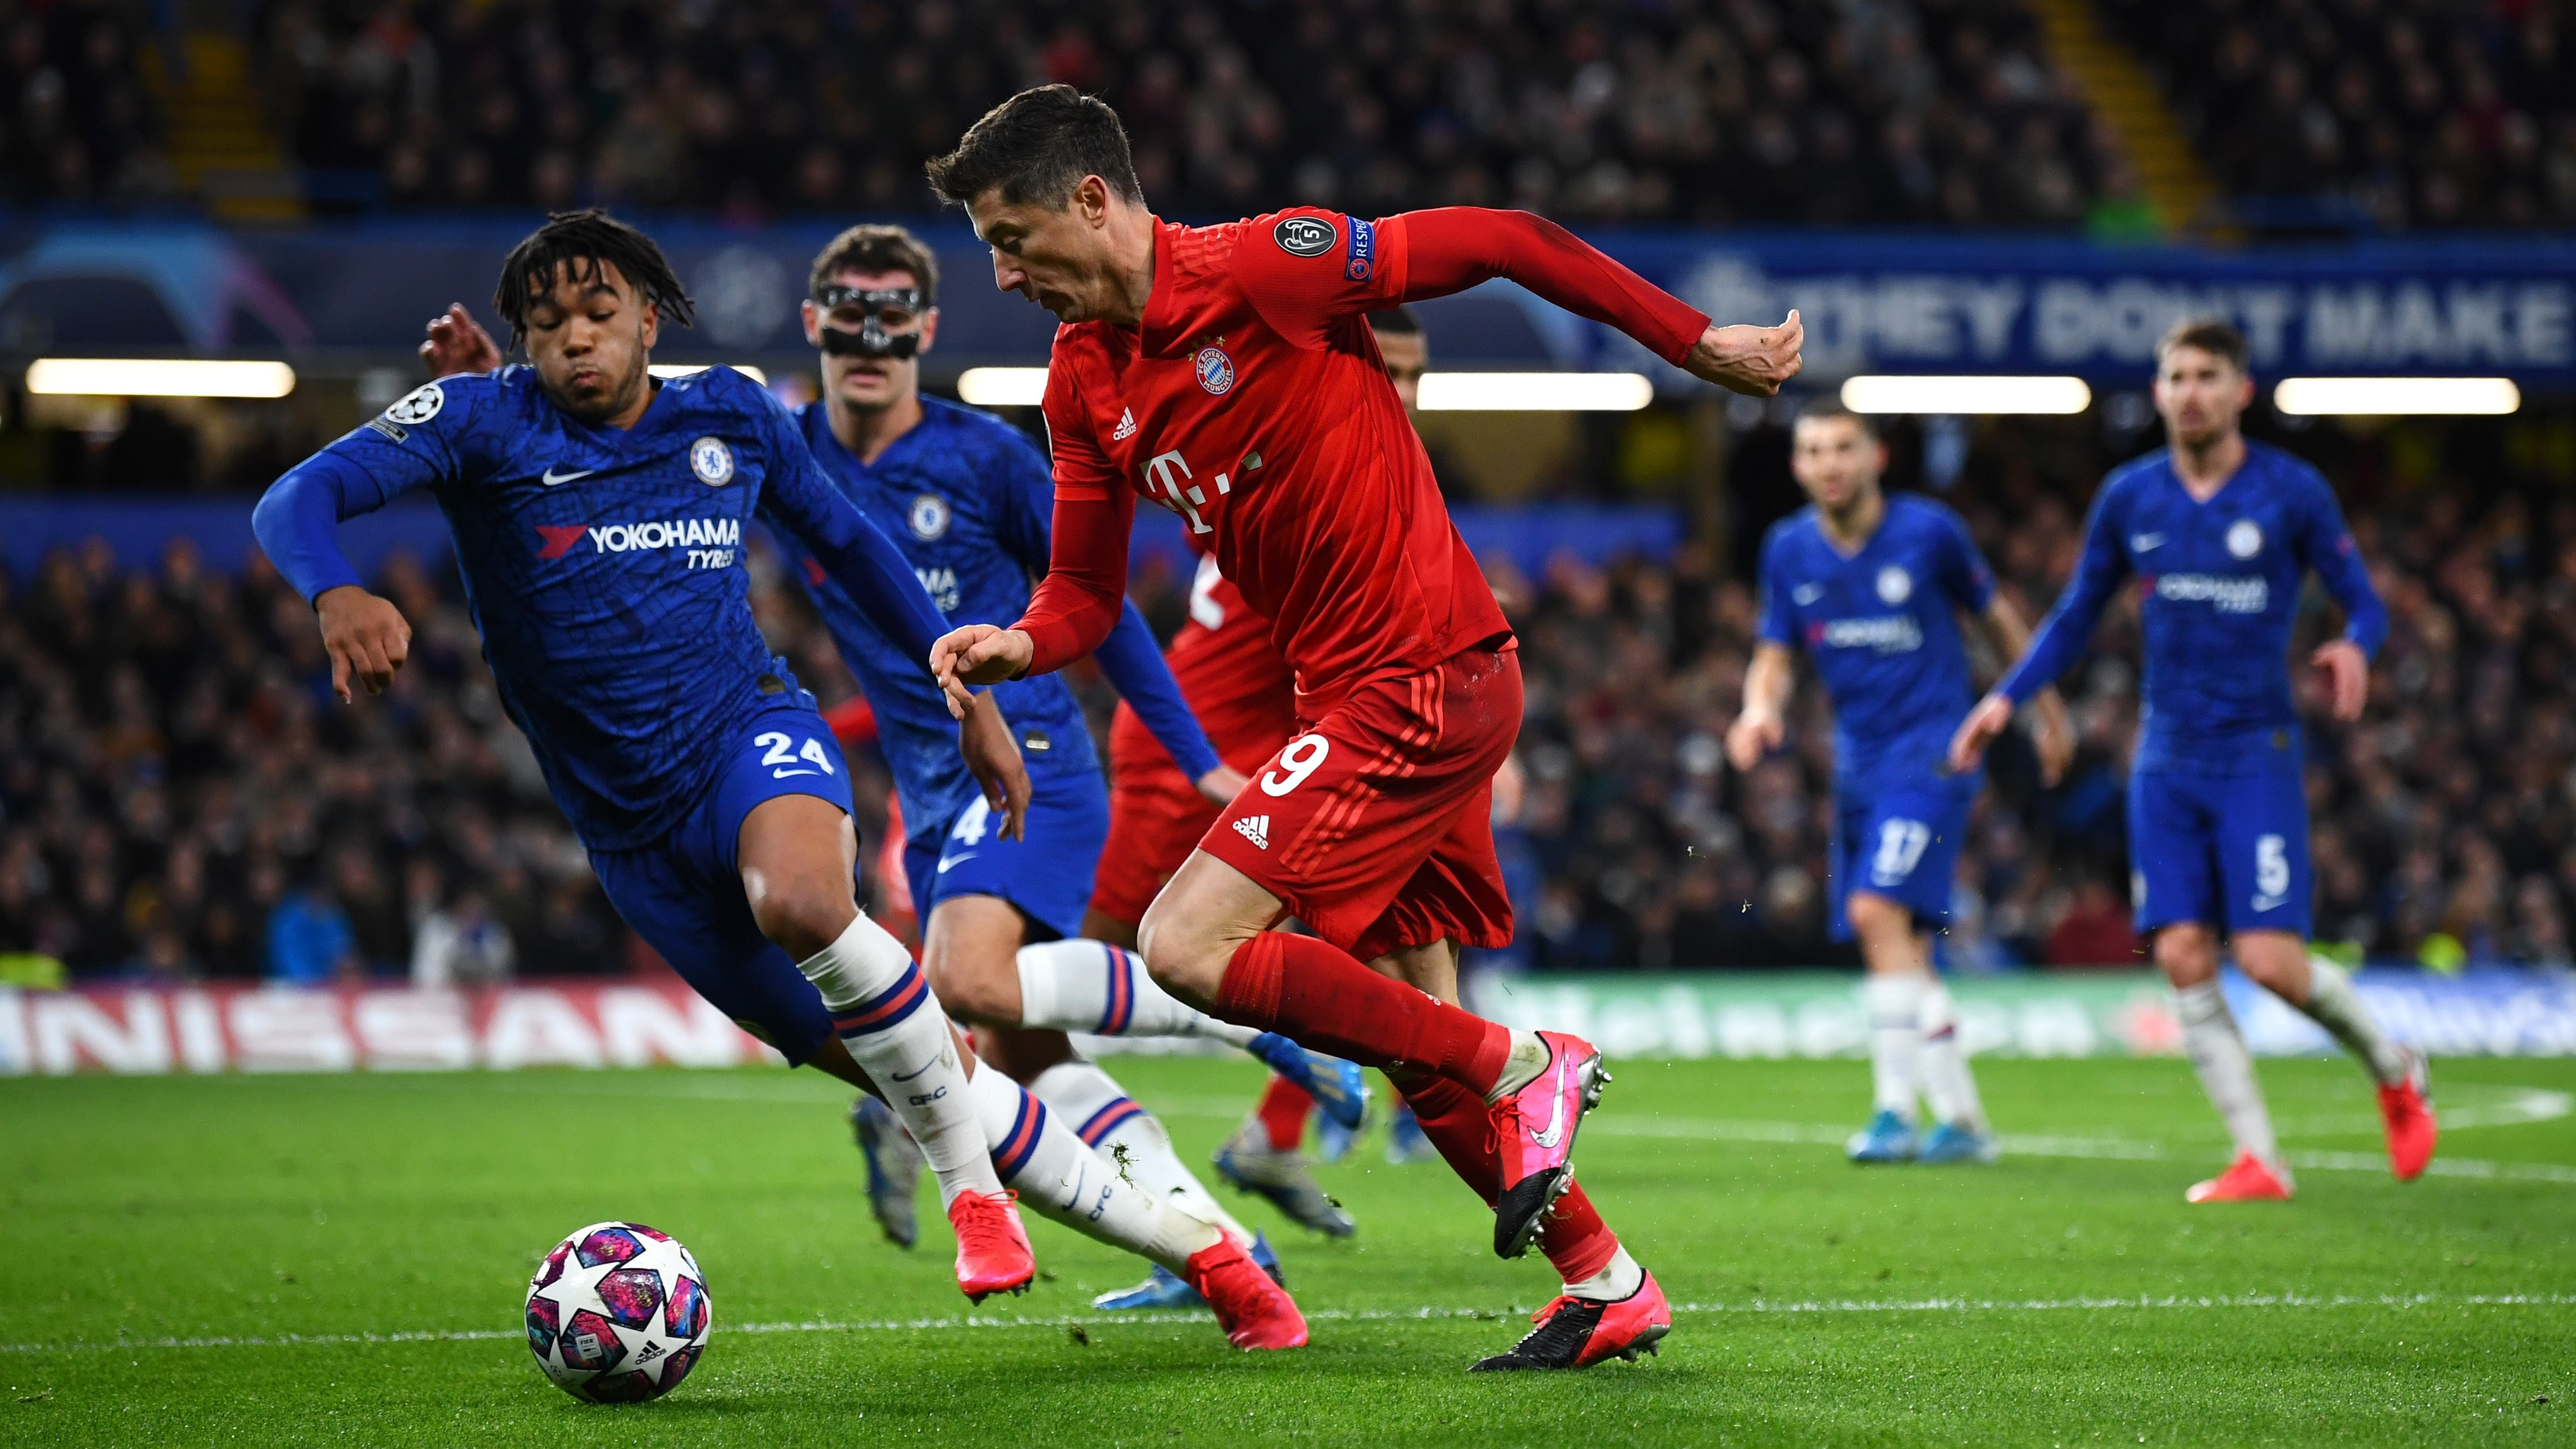 Bayern Gegen Chelsea Live